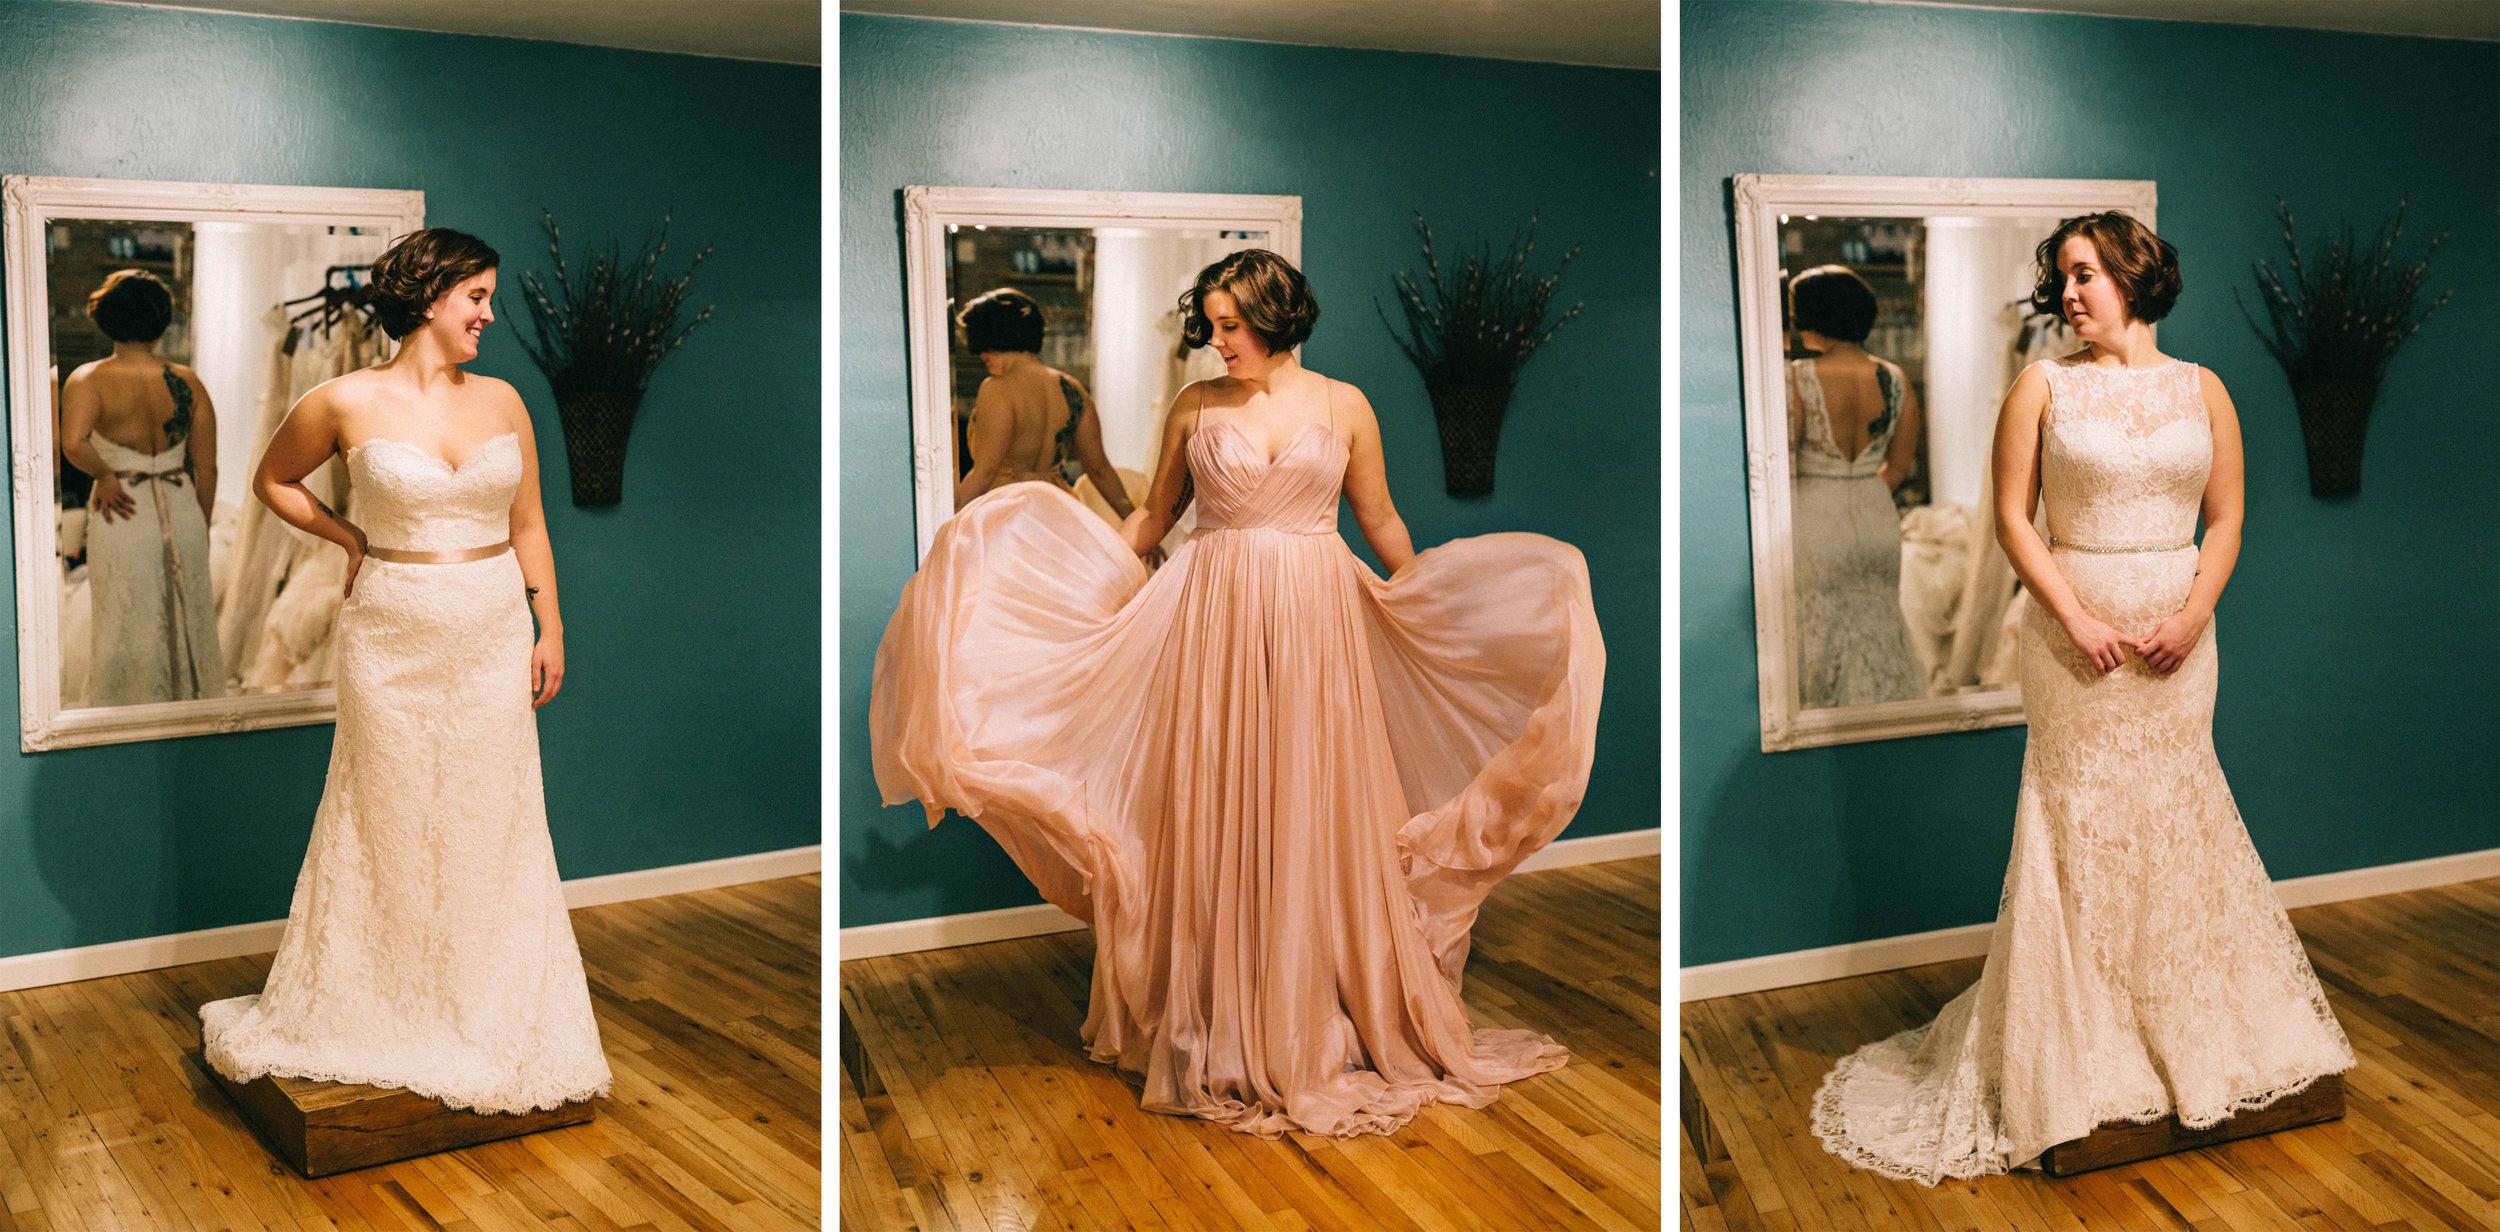 bateau-bridal-boutique-affordable-anchorage-wedding-dresses